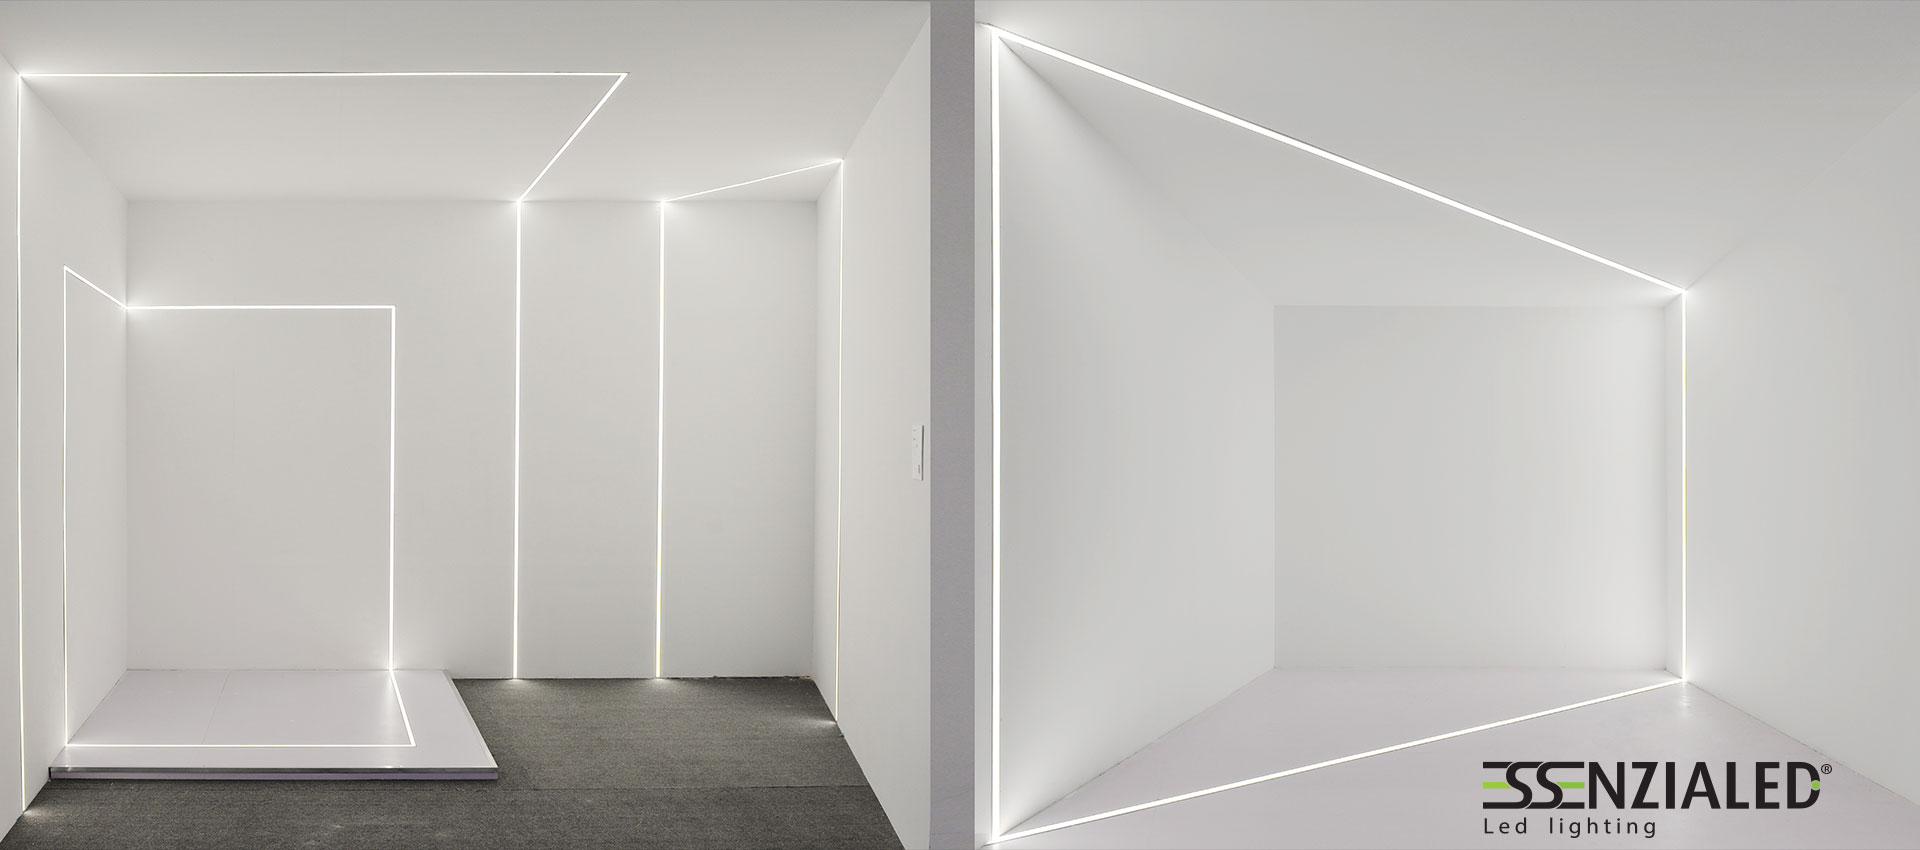 Inside tagli di luce cartongesso a led su misuraessenzialed illuminazione a led - Illuminazione da parete design ...